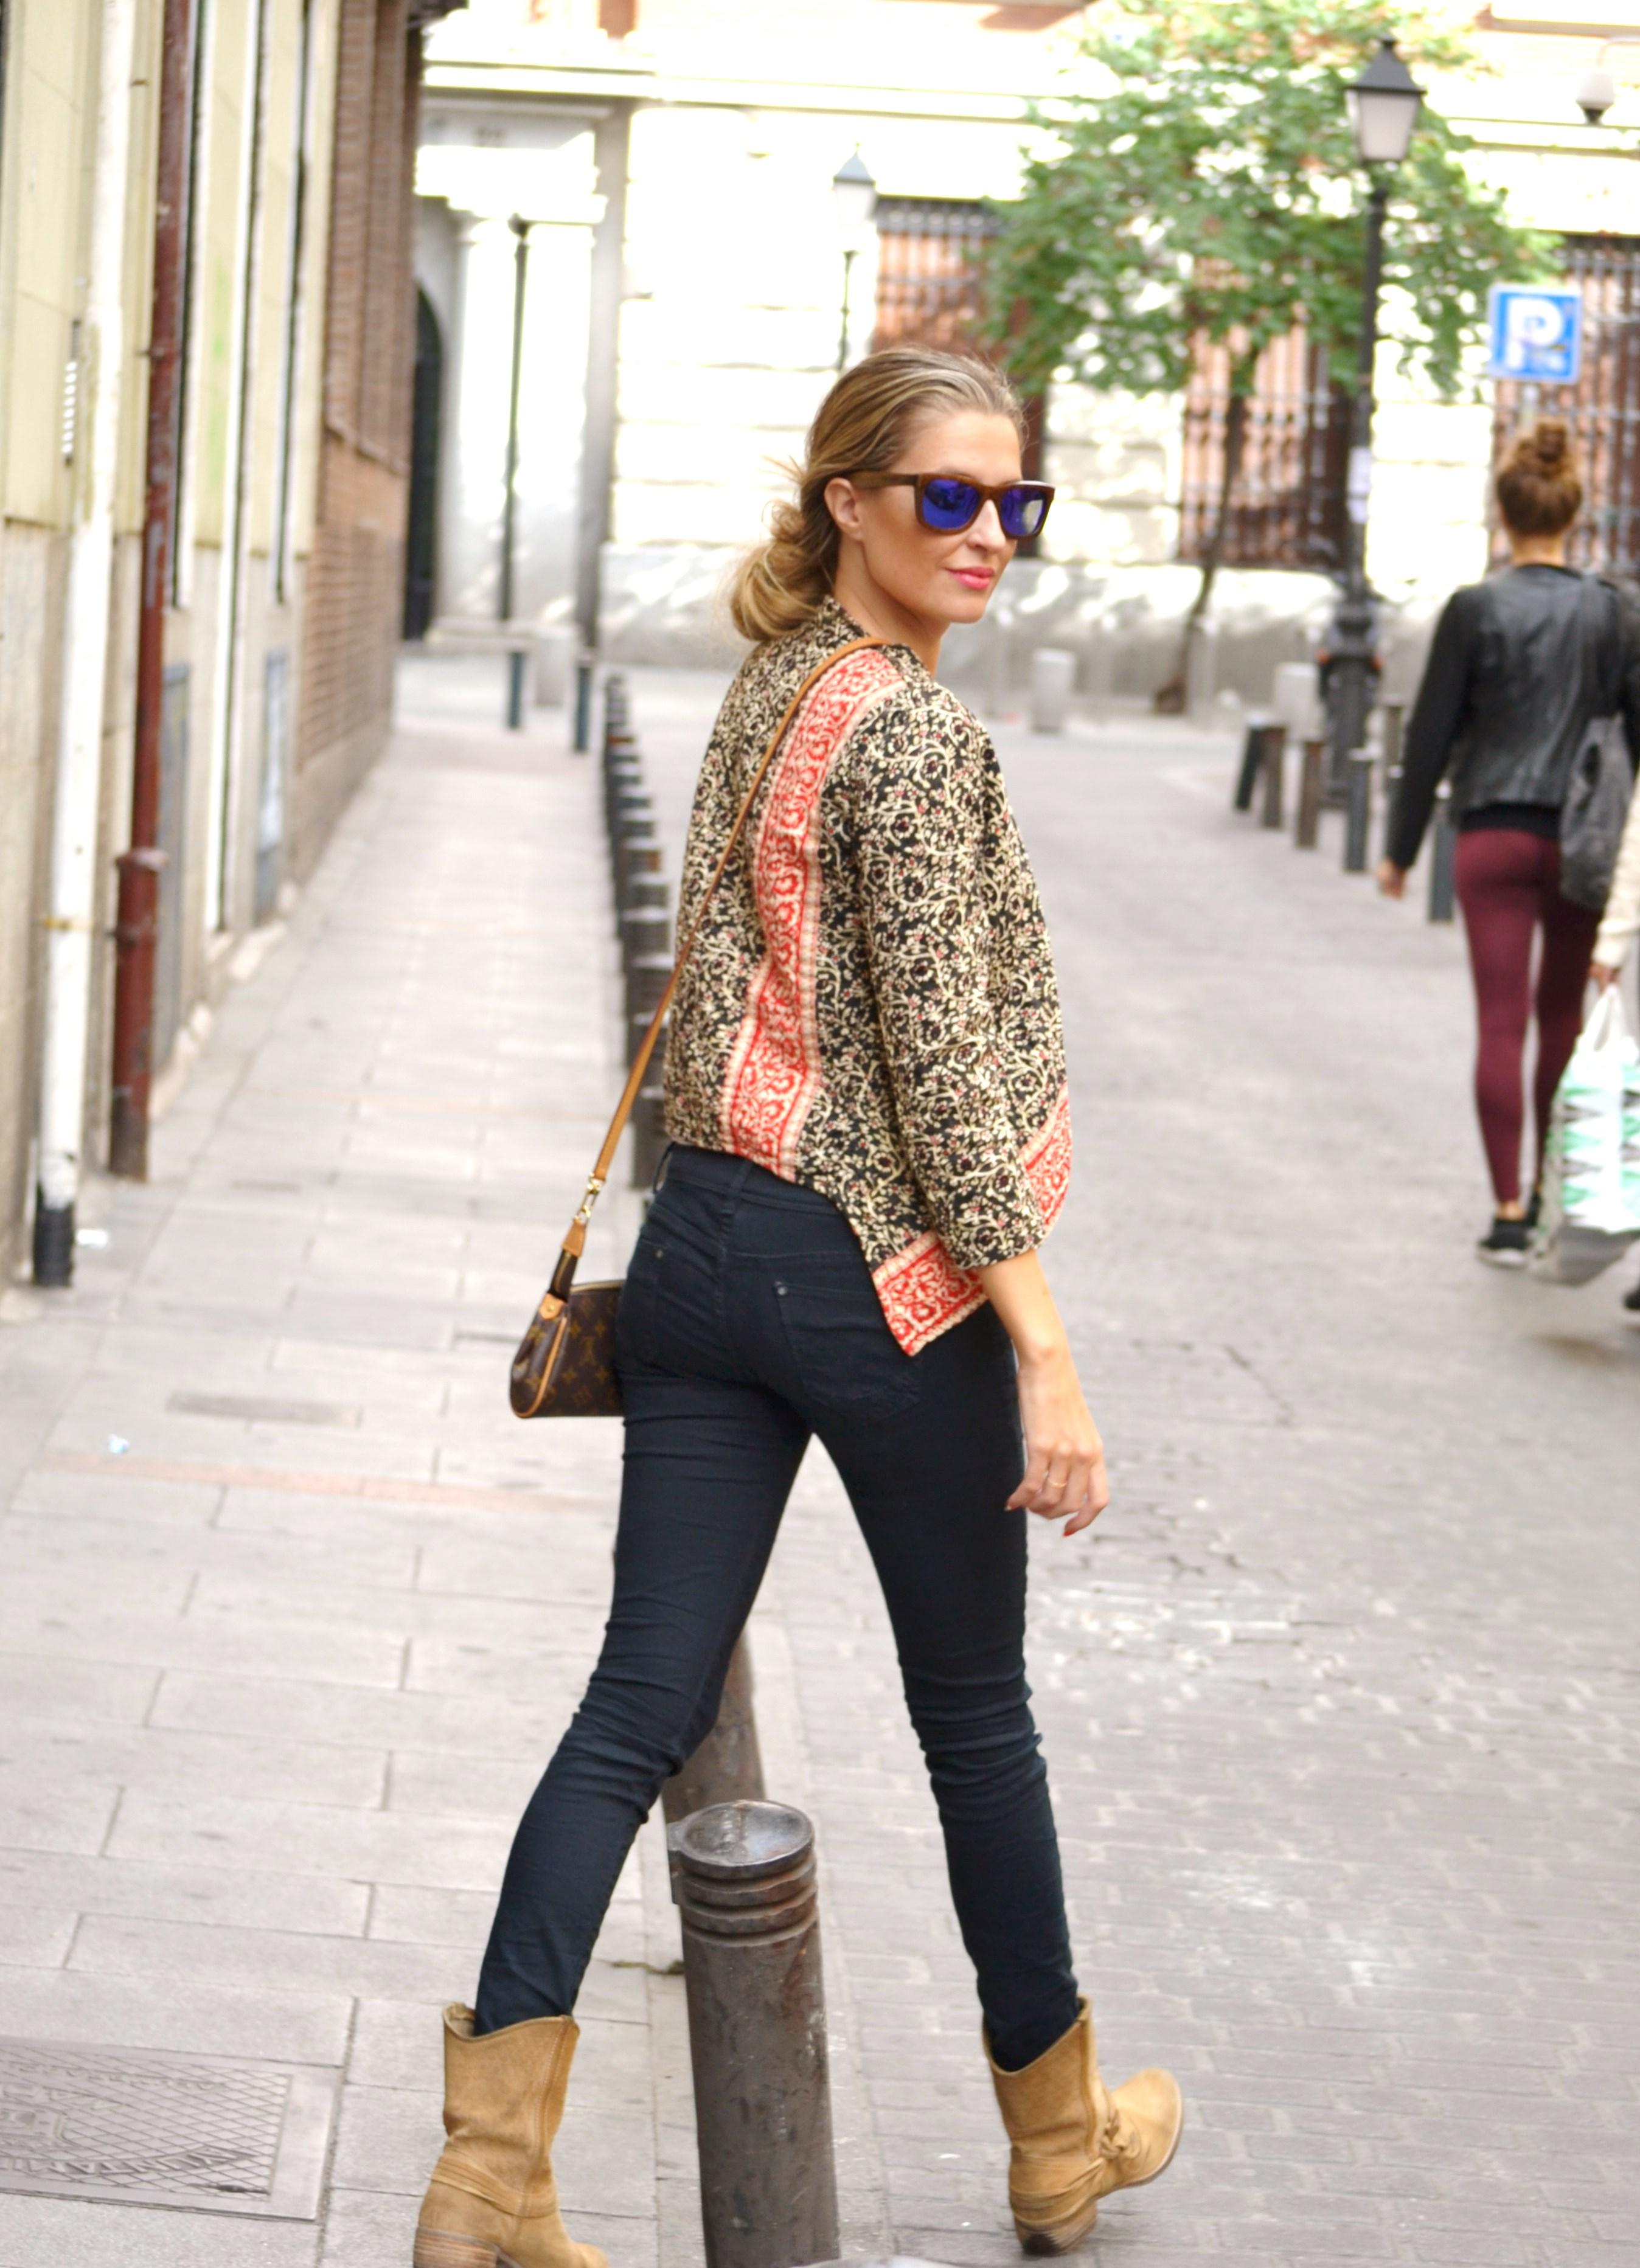 Karimba_Sunglasses_Mango_Skinny_Jeans_Alpe_Boots_Louis_Vuitton_Lara_Martin_Gilarranz_Bymyheels (9)